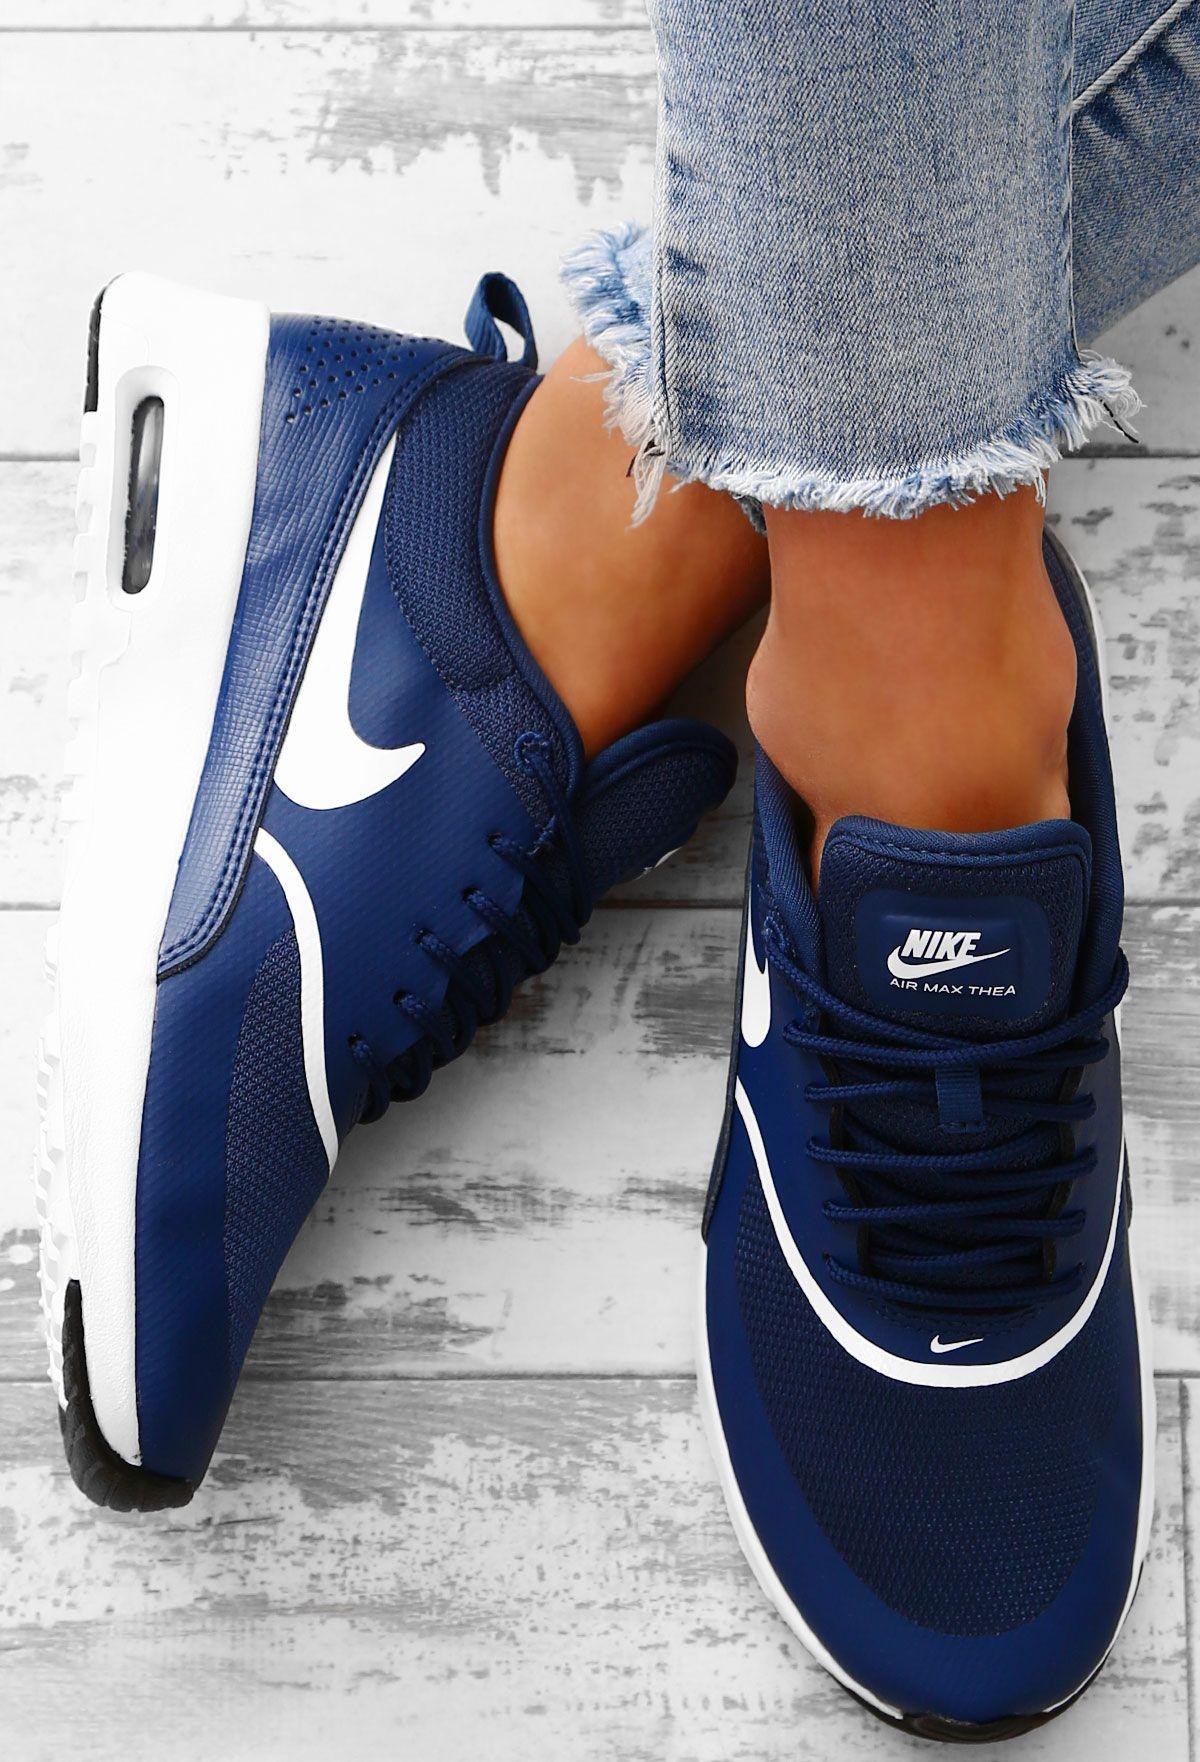 Nike Air Max Thea Navy Trainers UK 3 | Nike air max, Nike